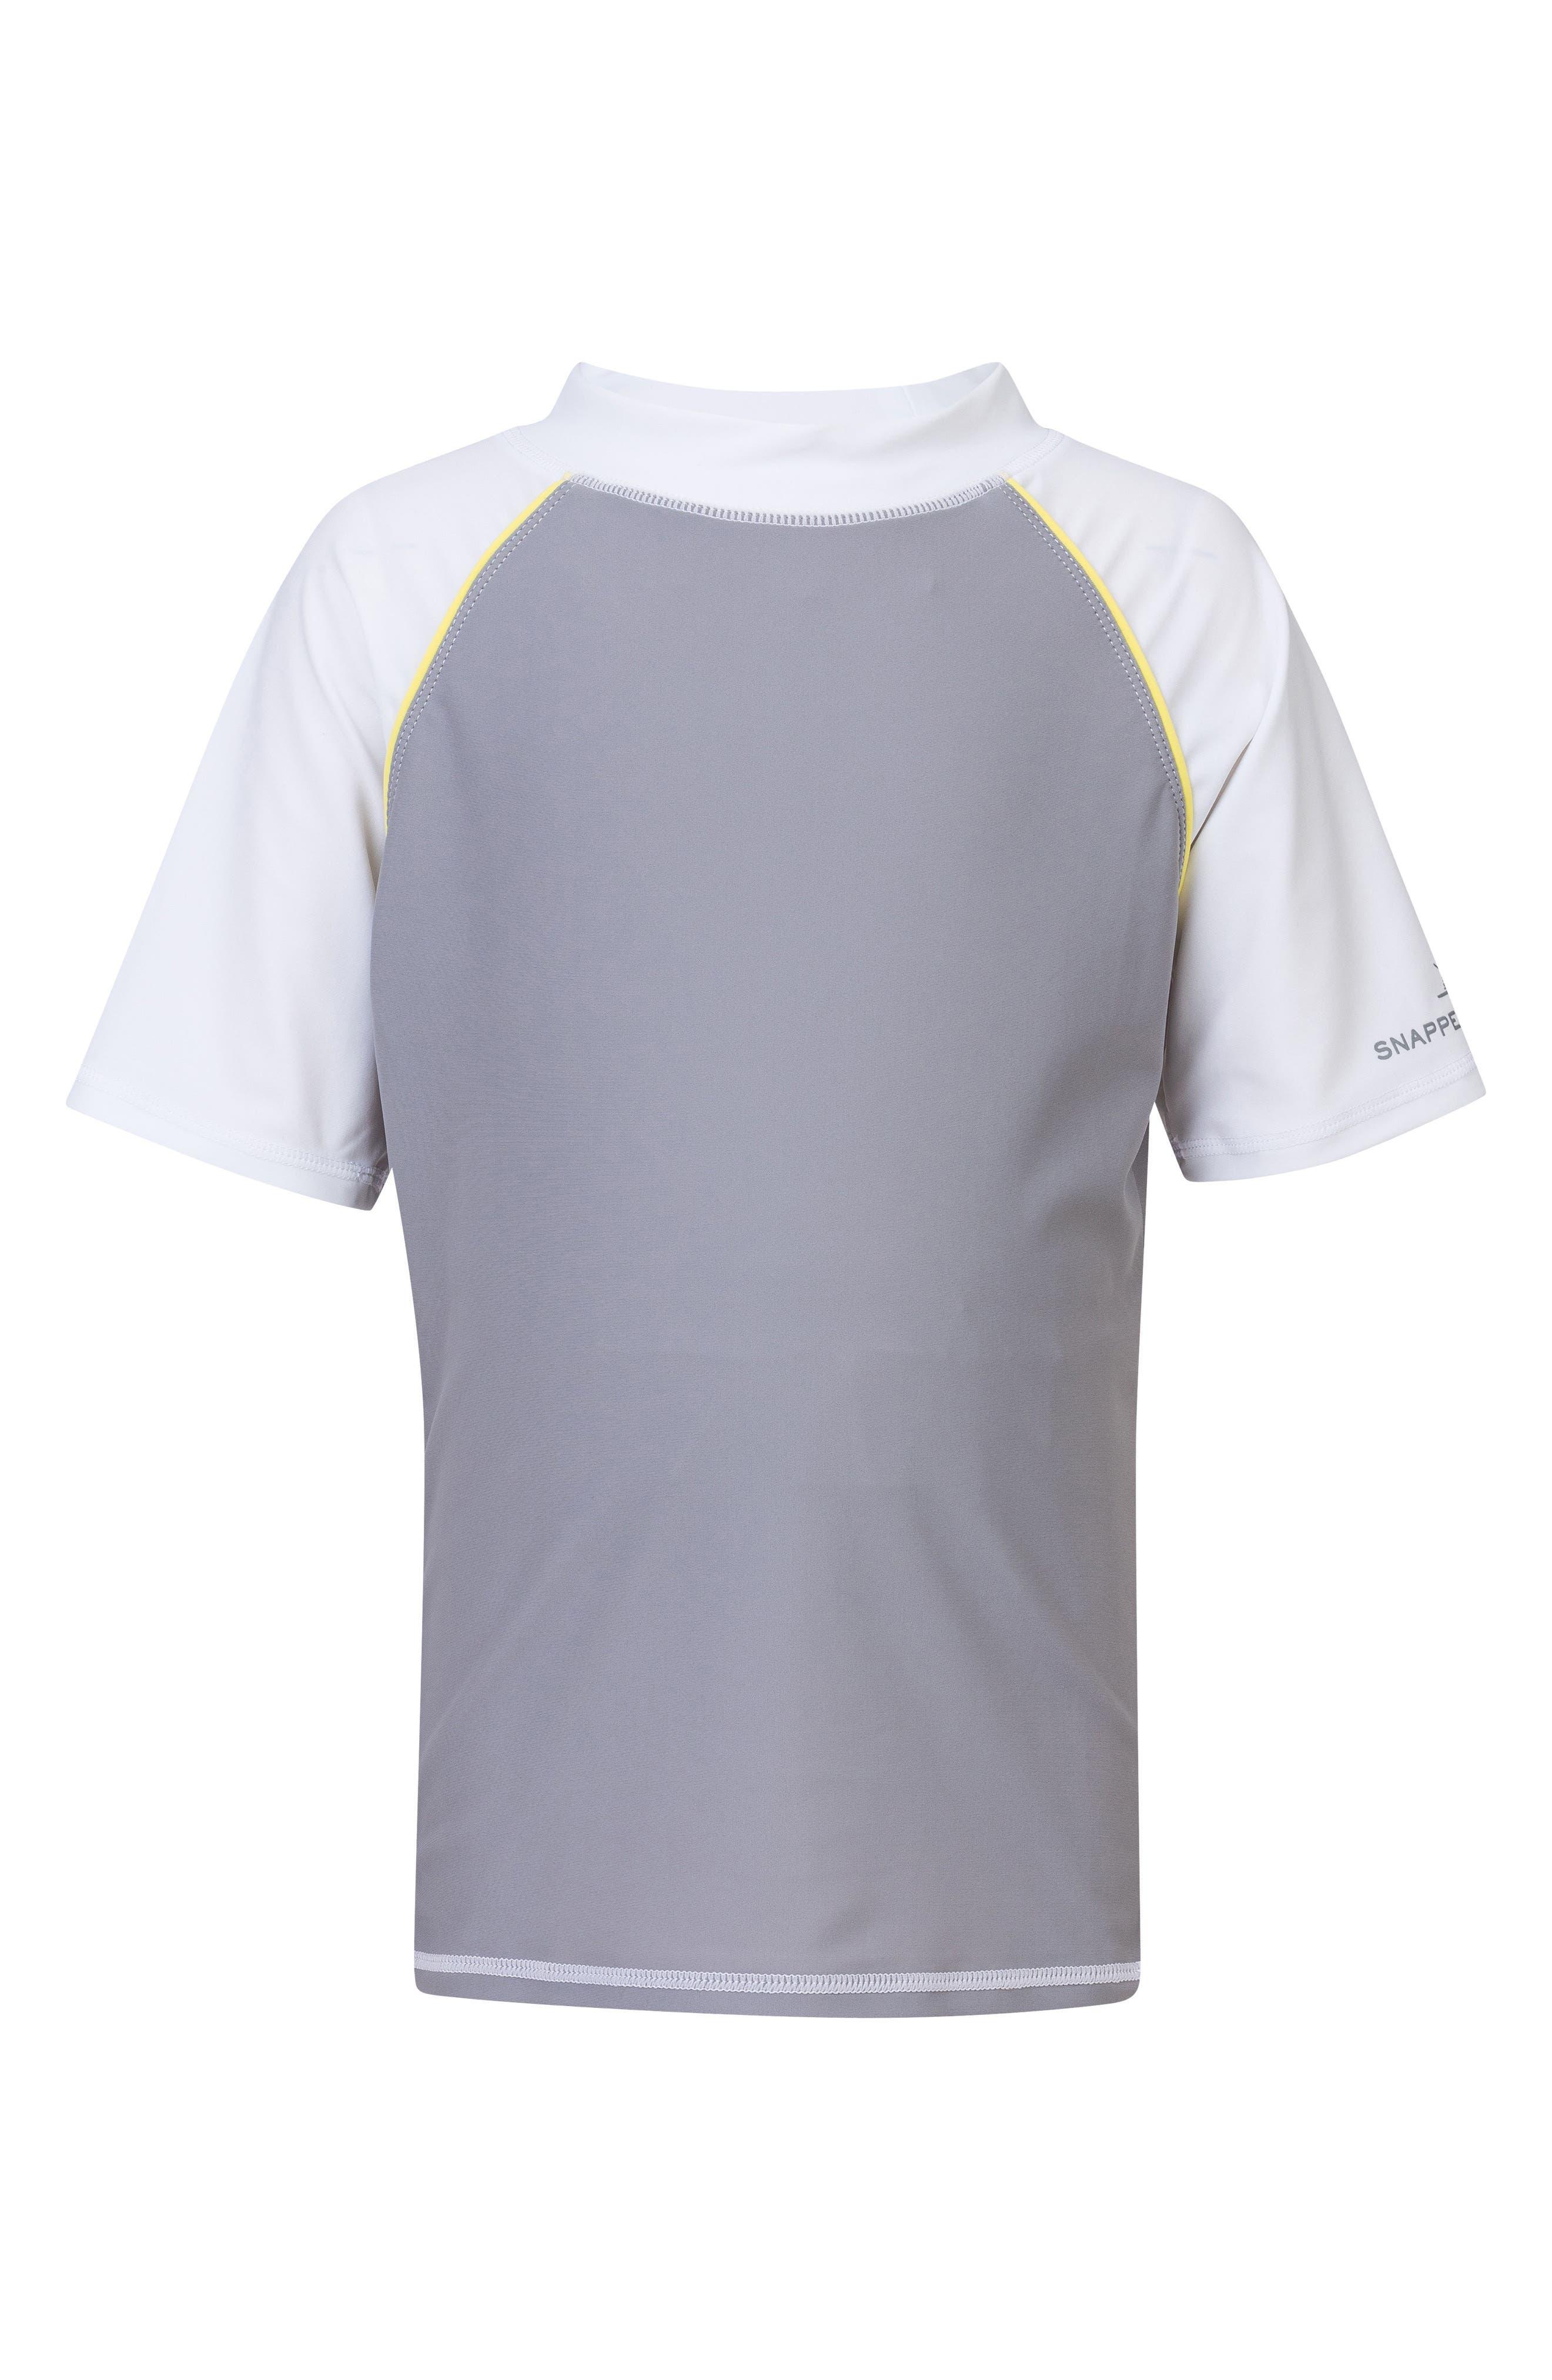 Raglan Short Sleeve Rashguard,                         Main,                         color, GREY/ WHITE